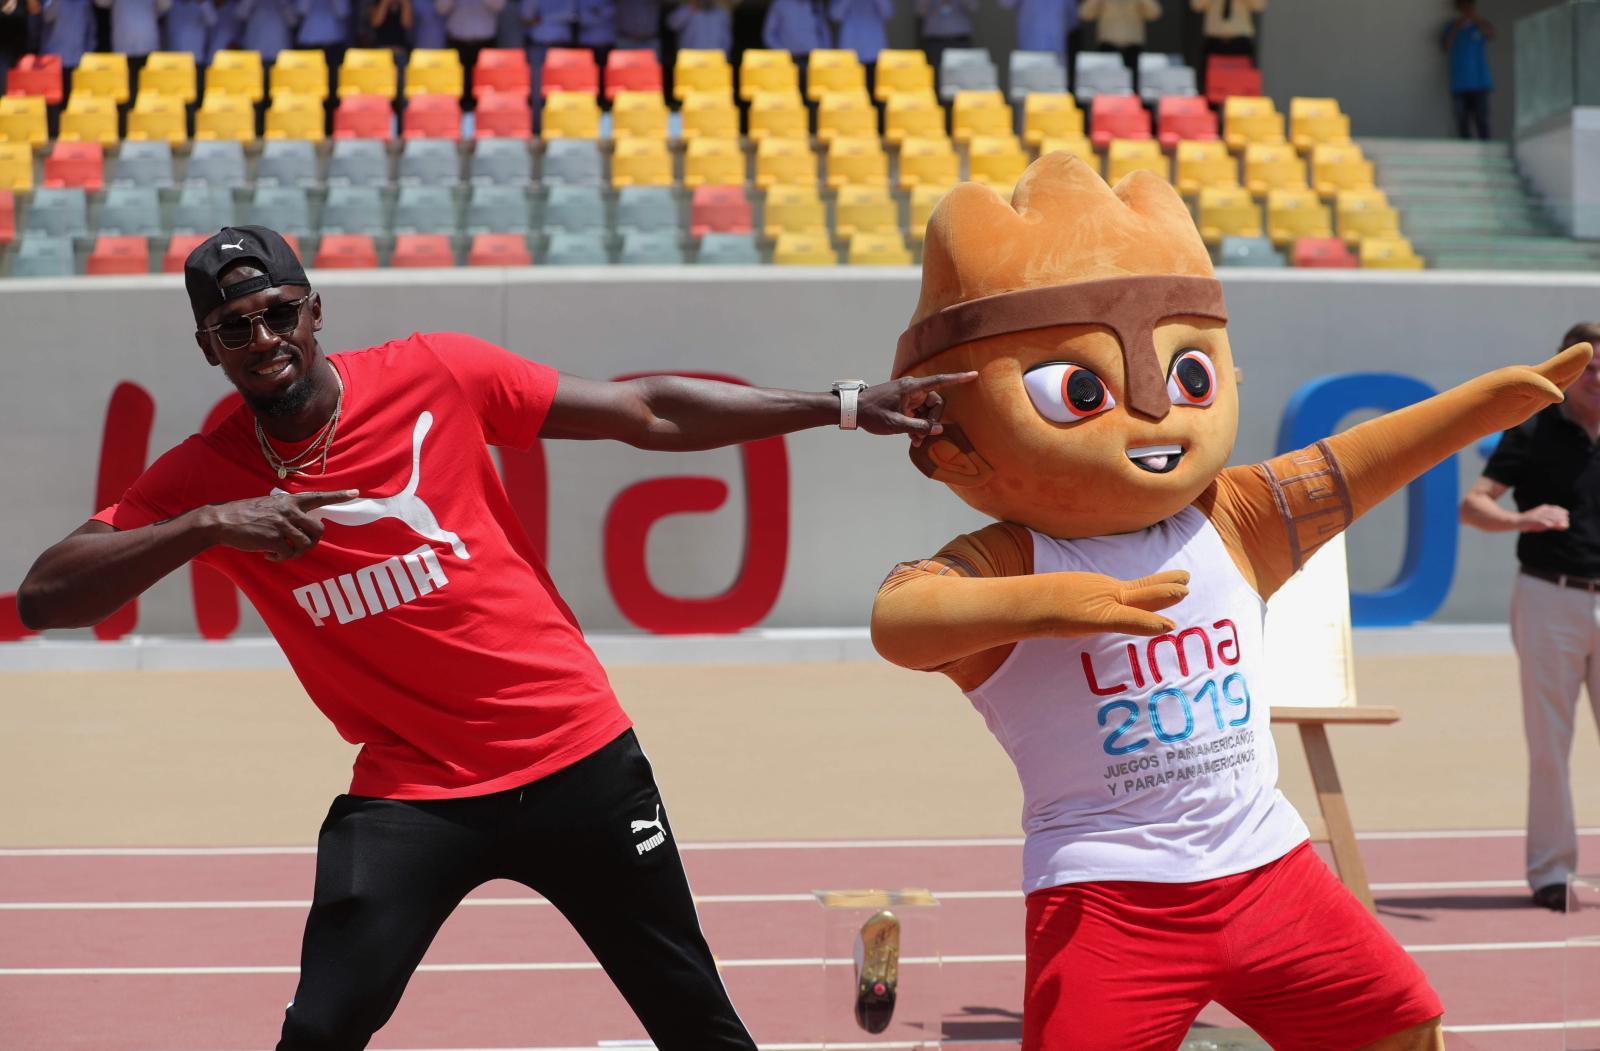 Usain Bolt odwiedził Limę, stolicę Peru. Fot. PAP/EPA/Ernesto Arias